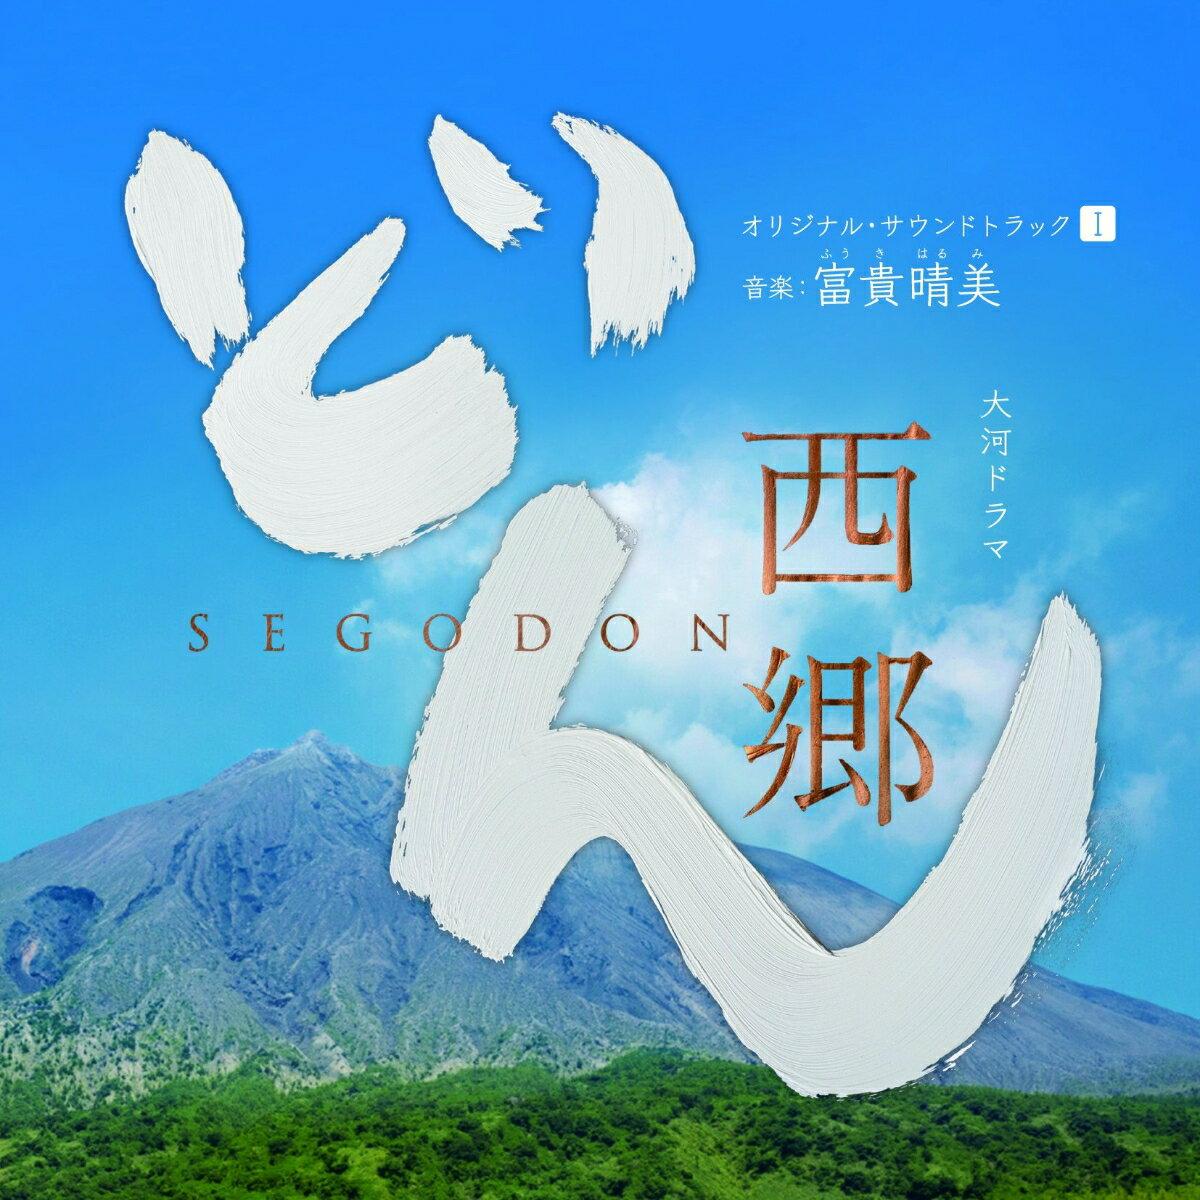 NHK大河ドラマ「西郷どん」オリジナル・サウンドトラック1 音楽:富貴晴美 [ 里アンナ、他 ]